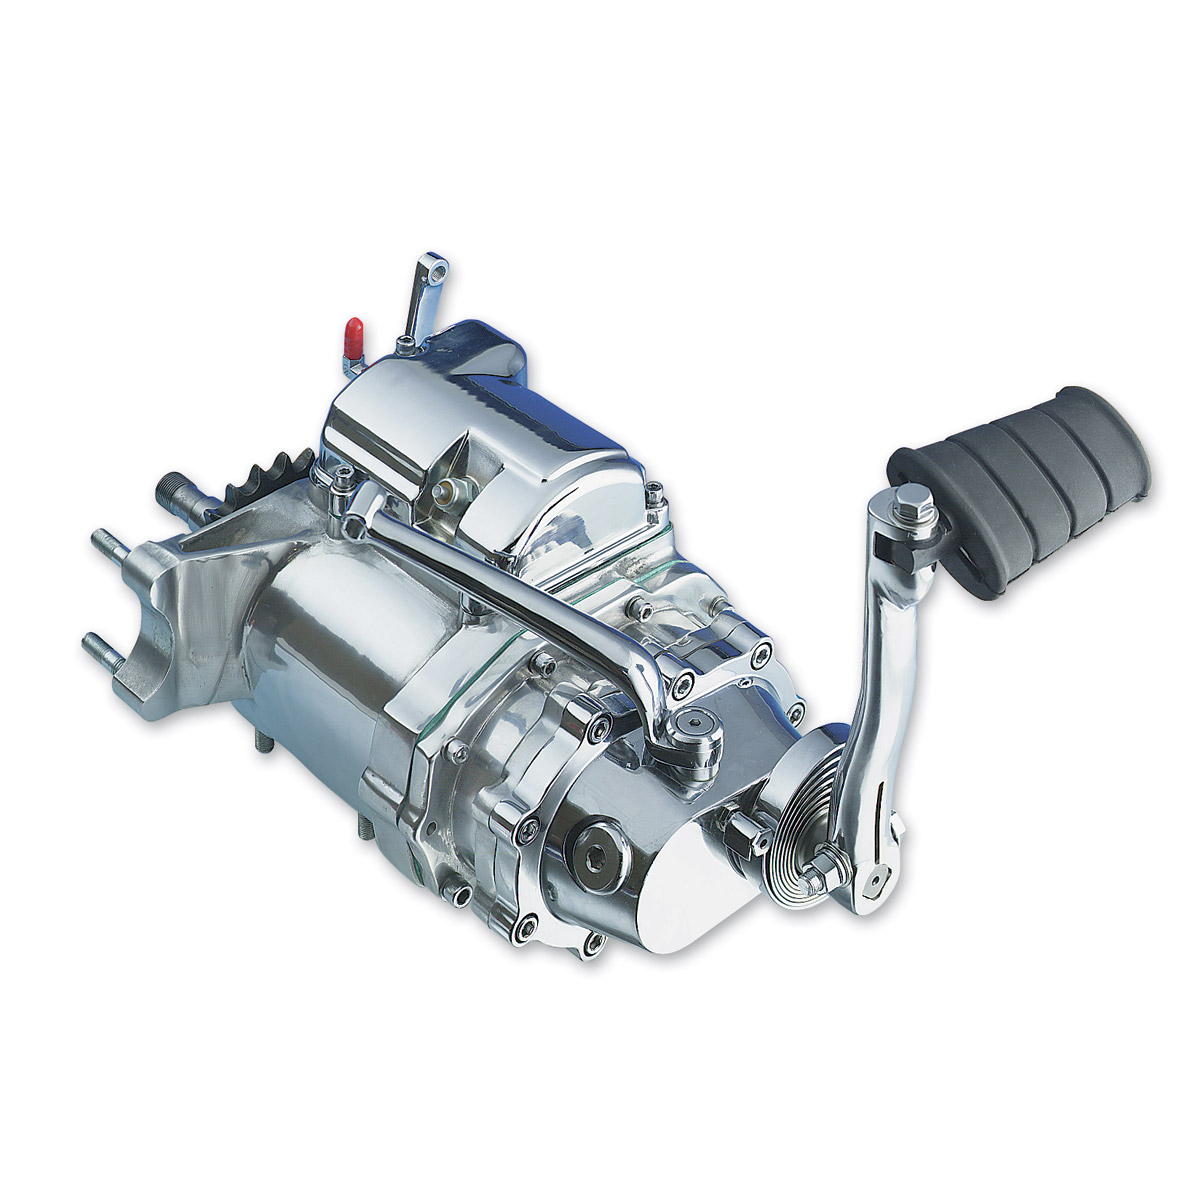 Kawasaki Kfx Power Wheels Wiring Diagram Auto Electrical Get Free Image About